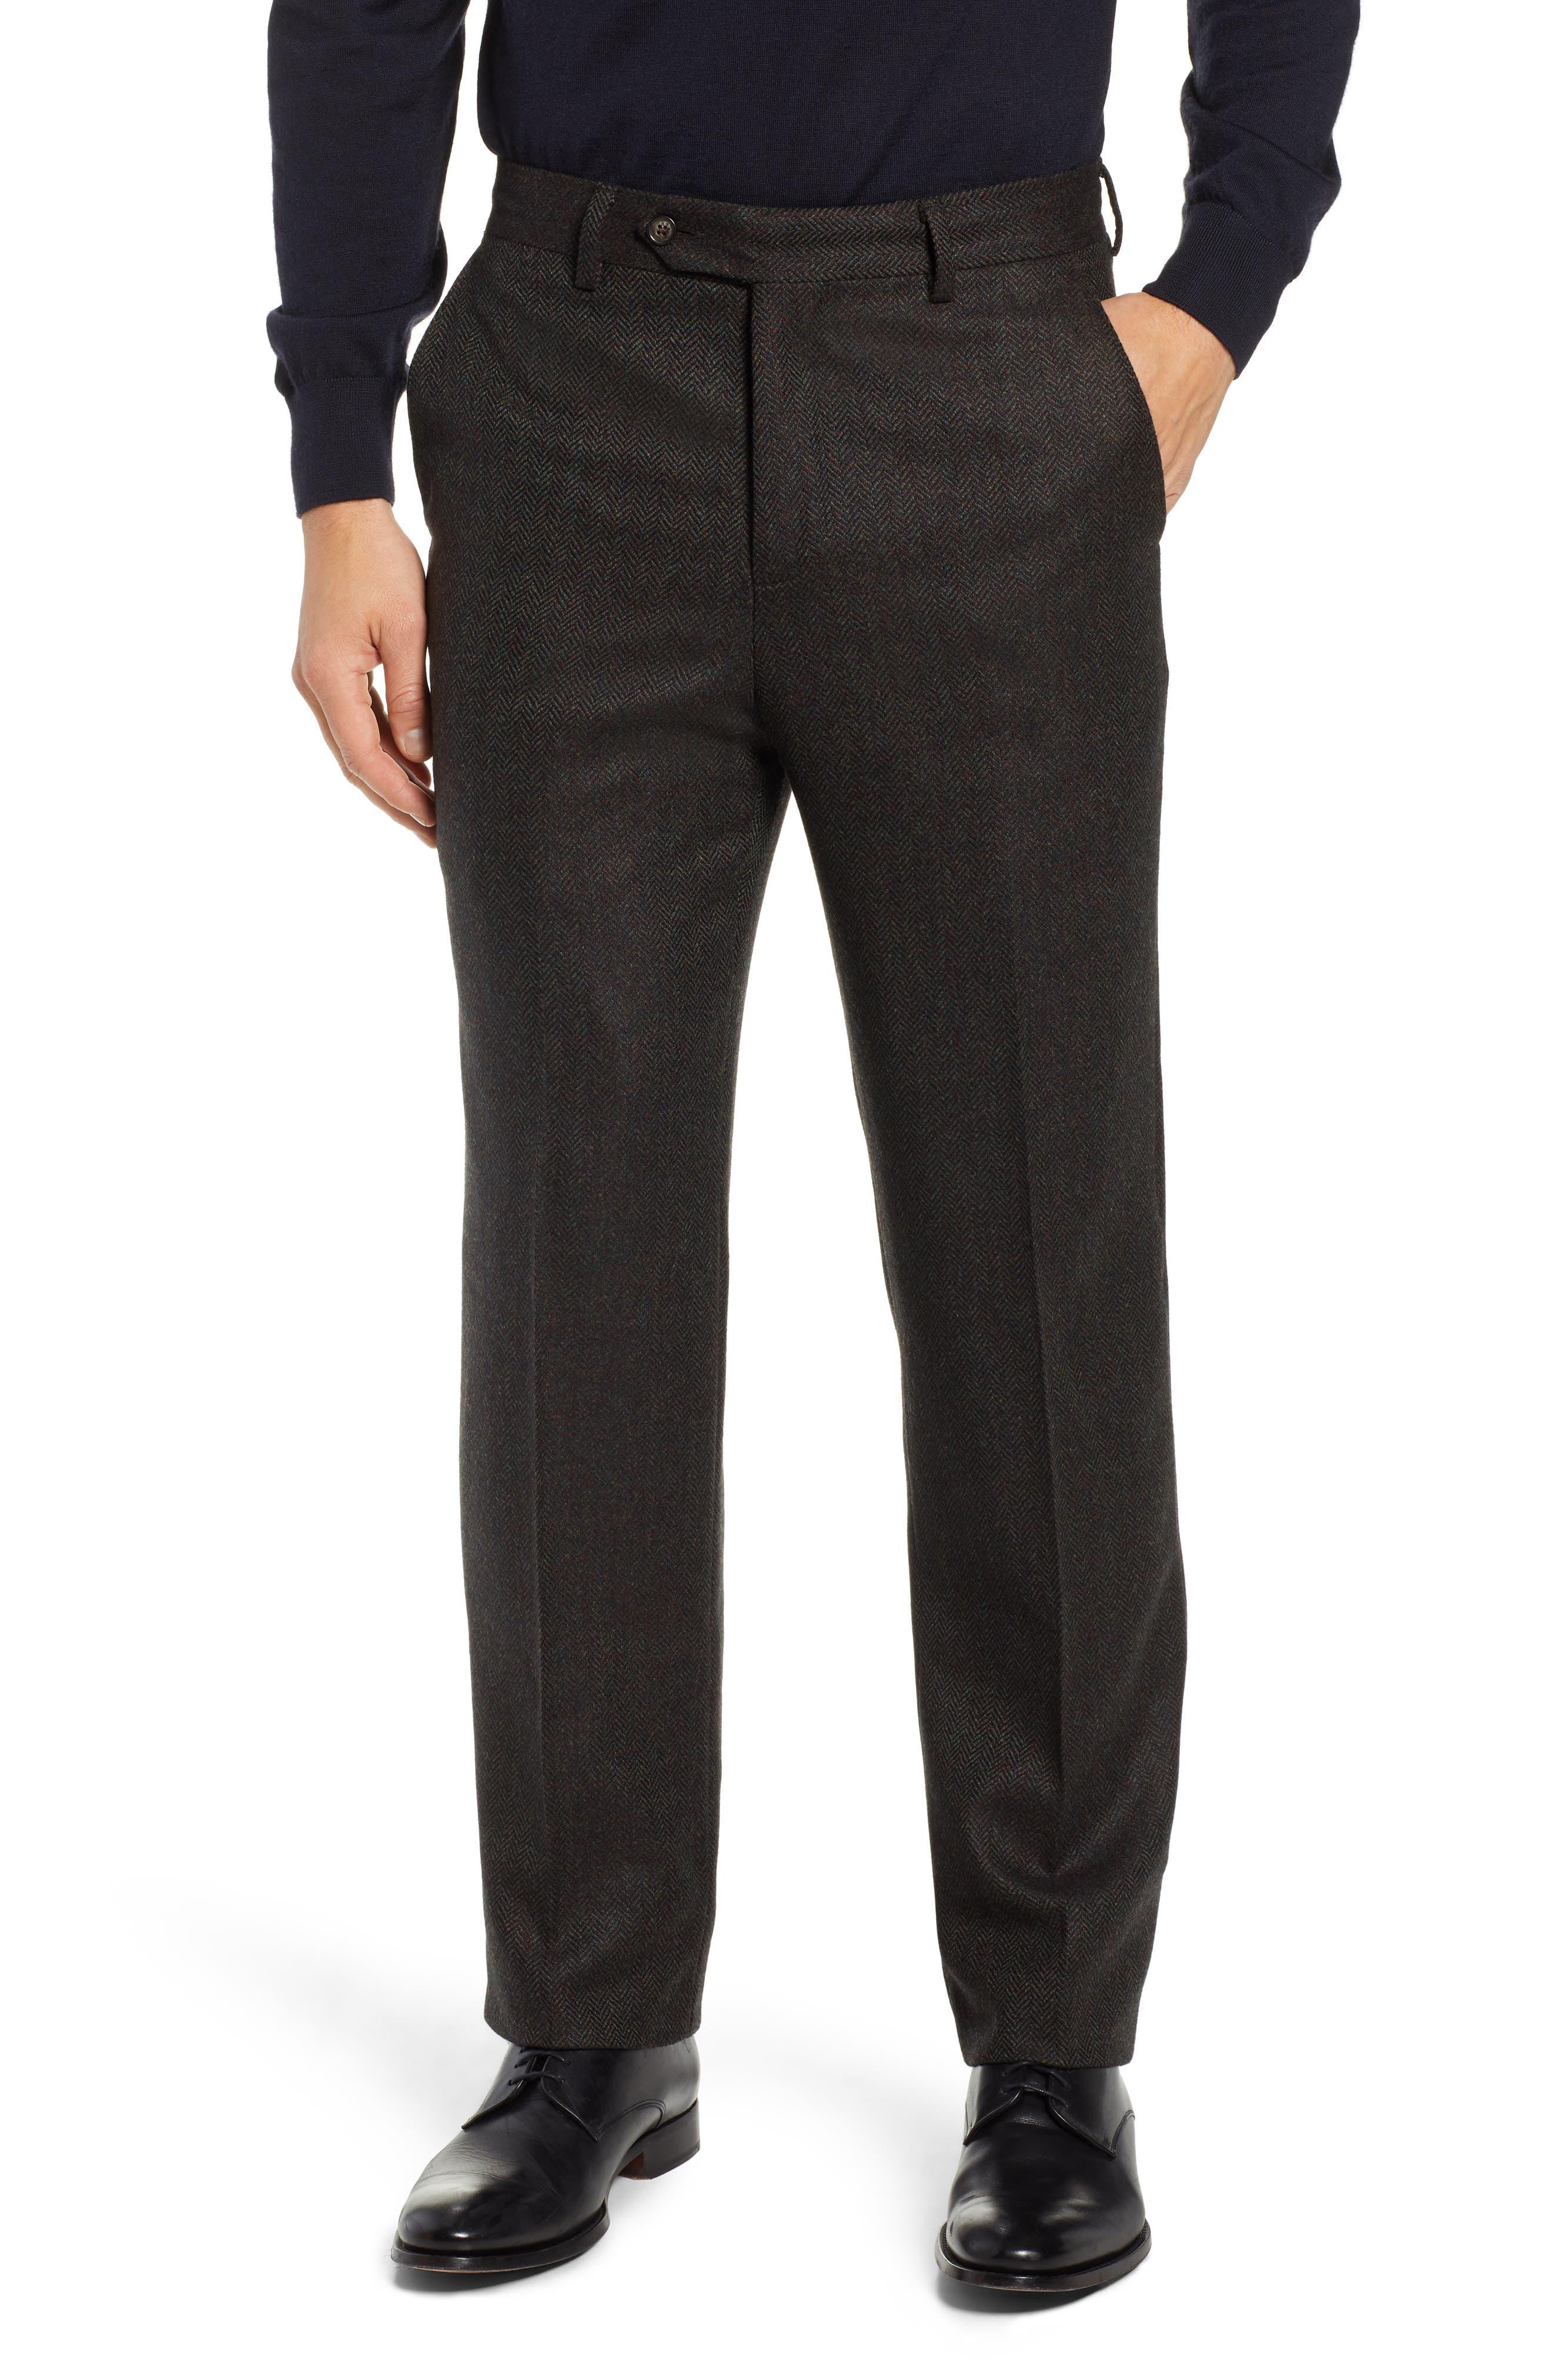 Flat Front Herringbone Wool & Cashmere Trousers,                         Main,                         color, DARK OLIVE